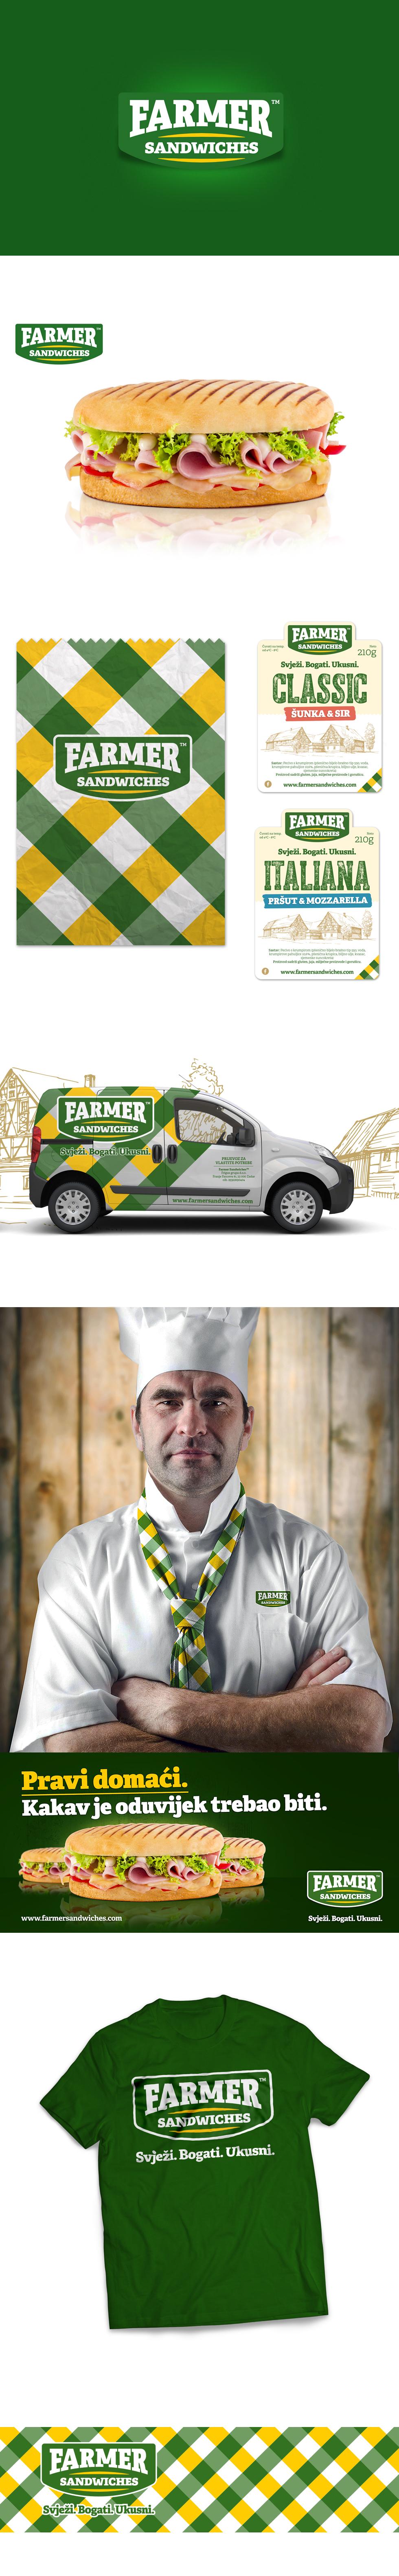 Preza_Farmer_3